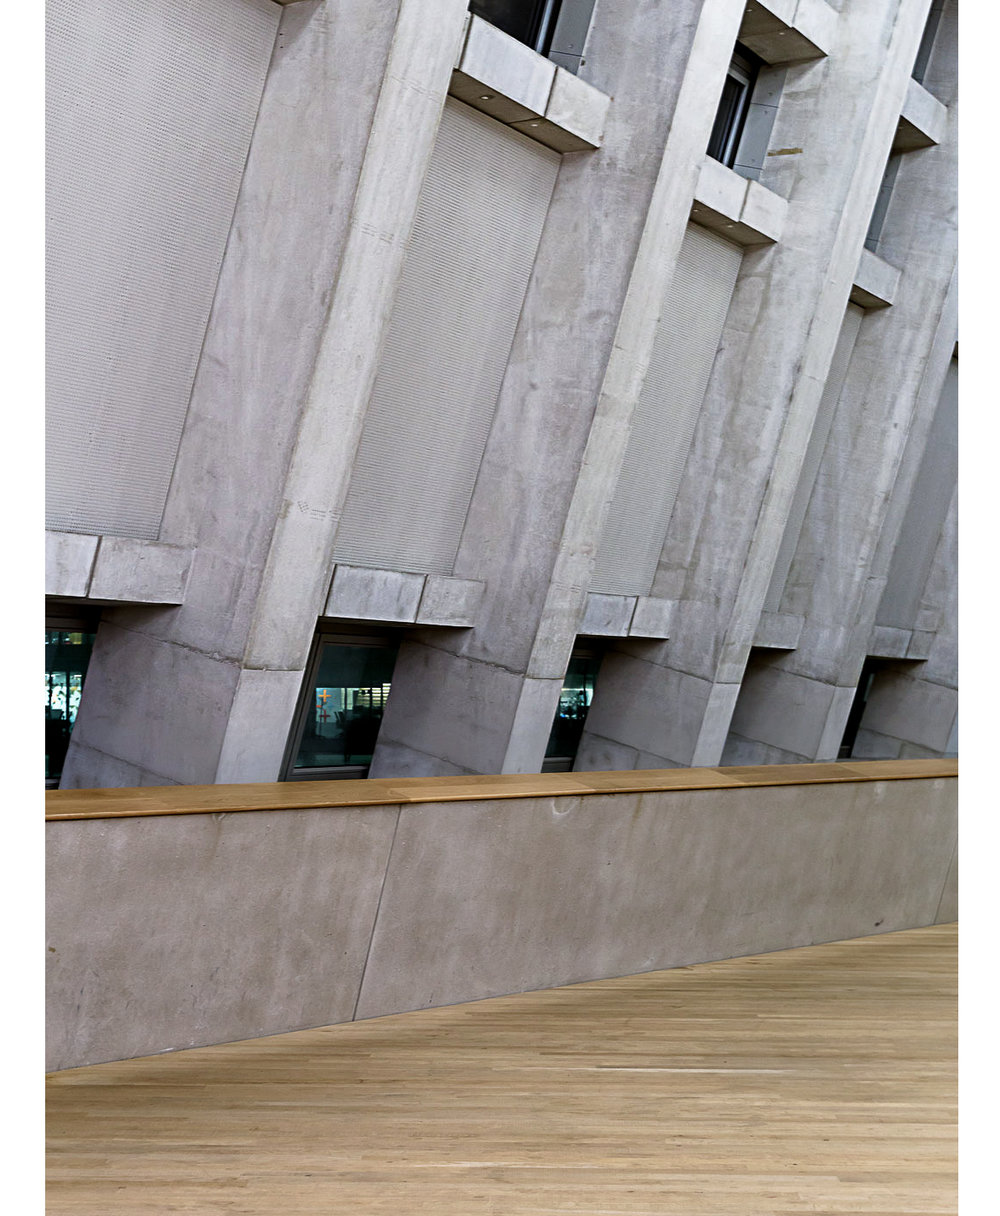 steve-de-vriendttatemodern-building09.jpg